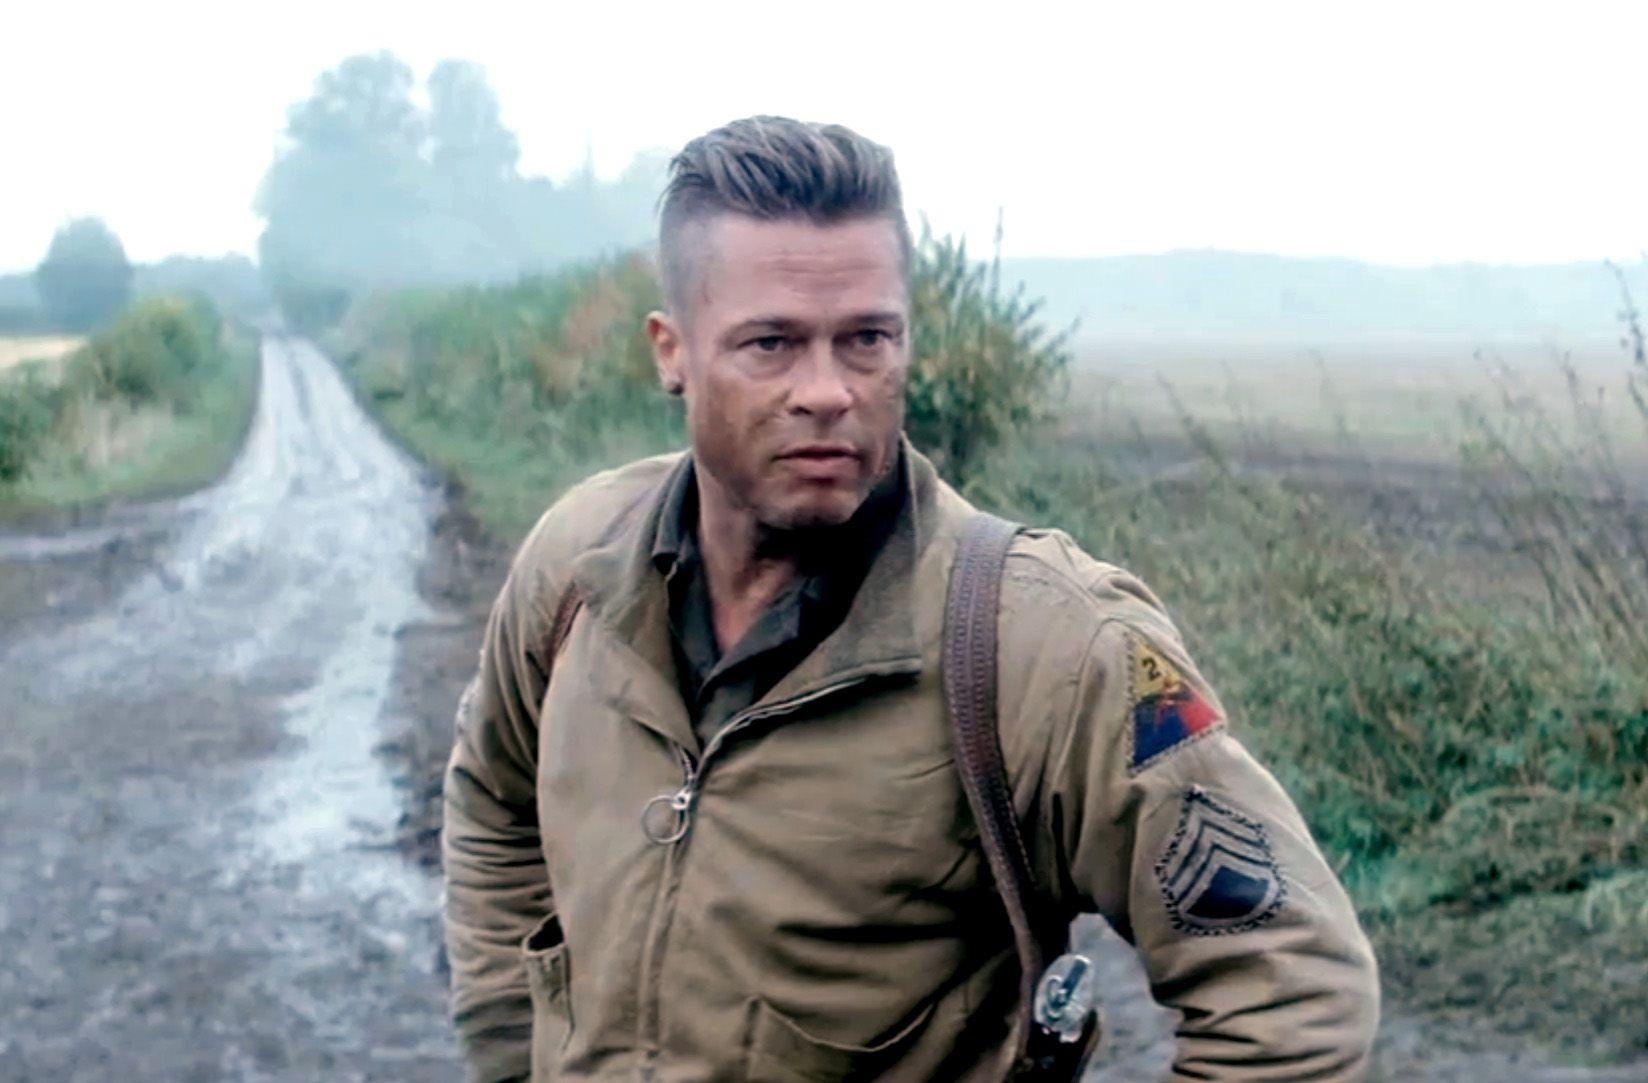 Líder. Brad Pitt interpreta a Don Wardaddy Collier